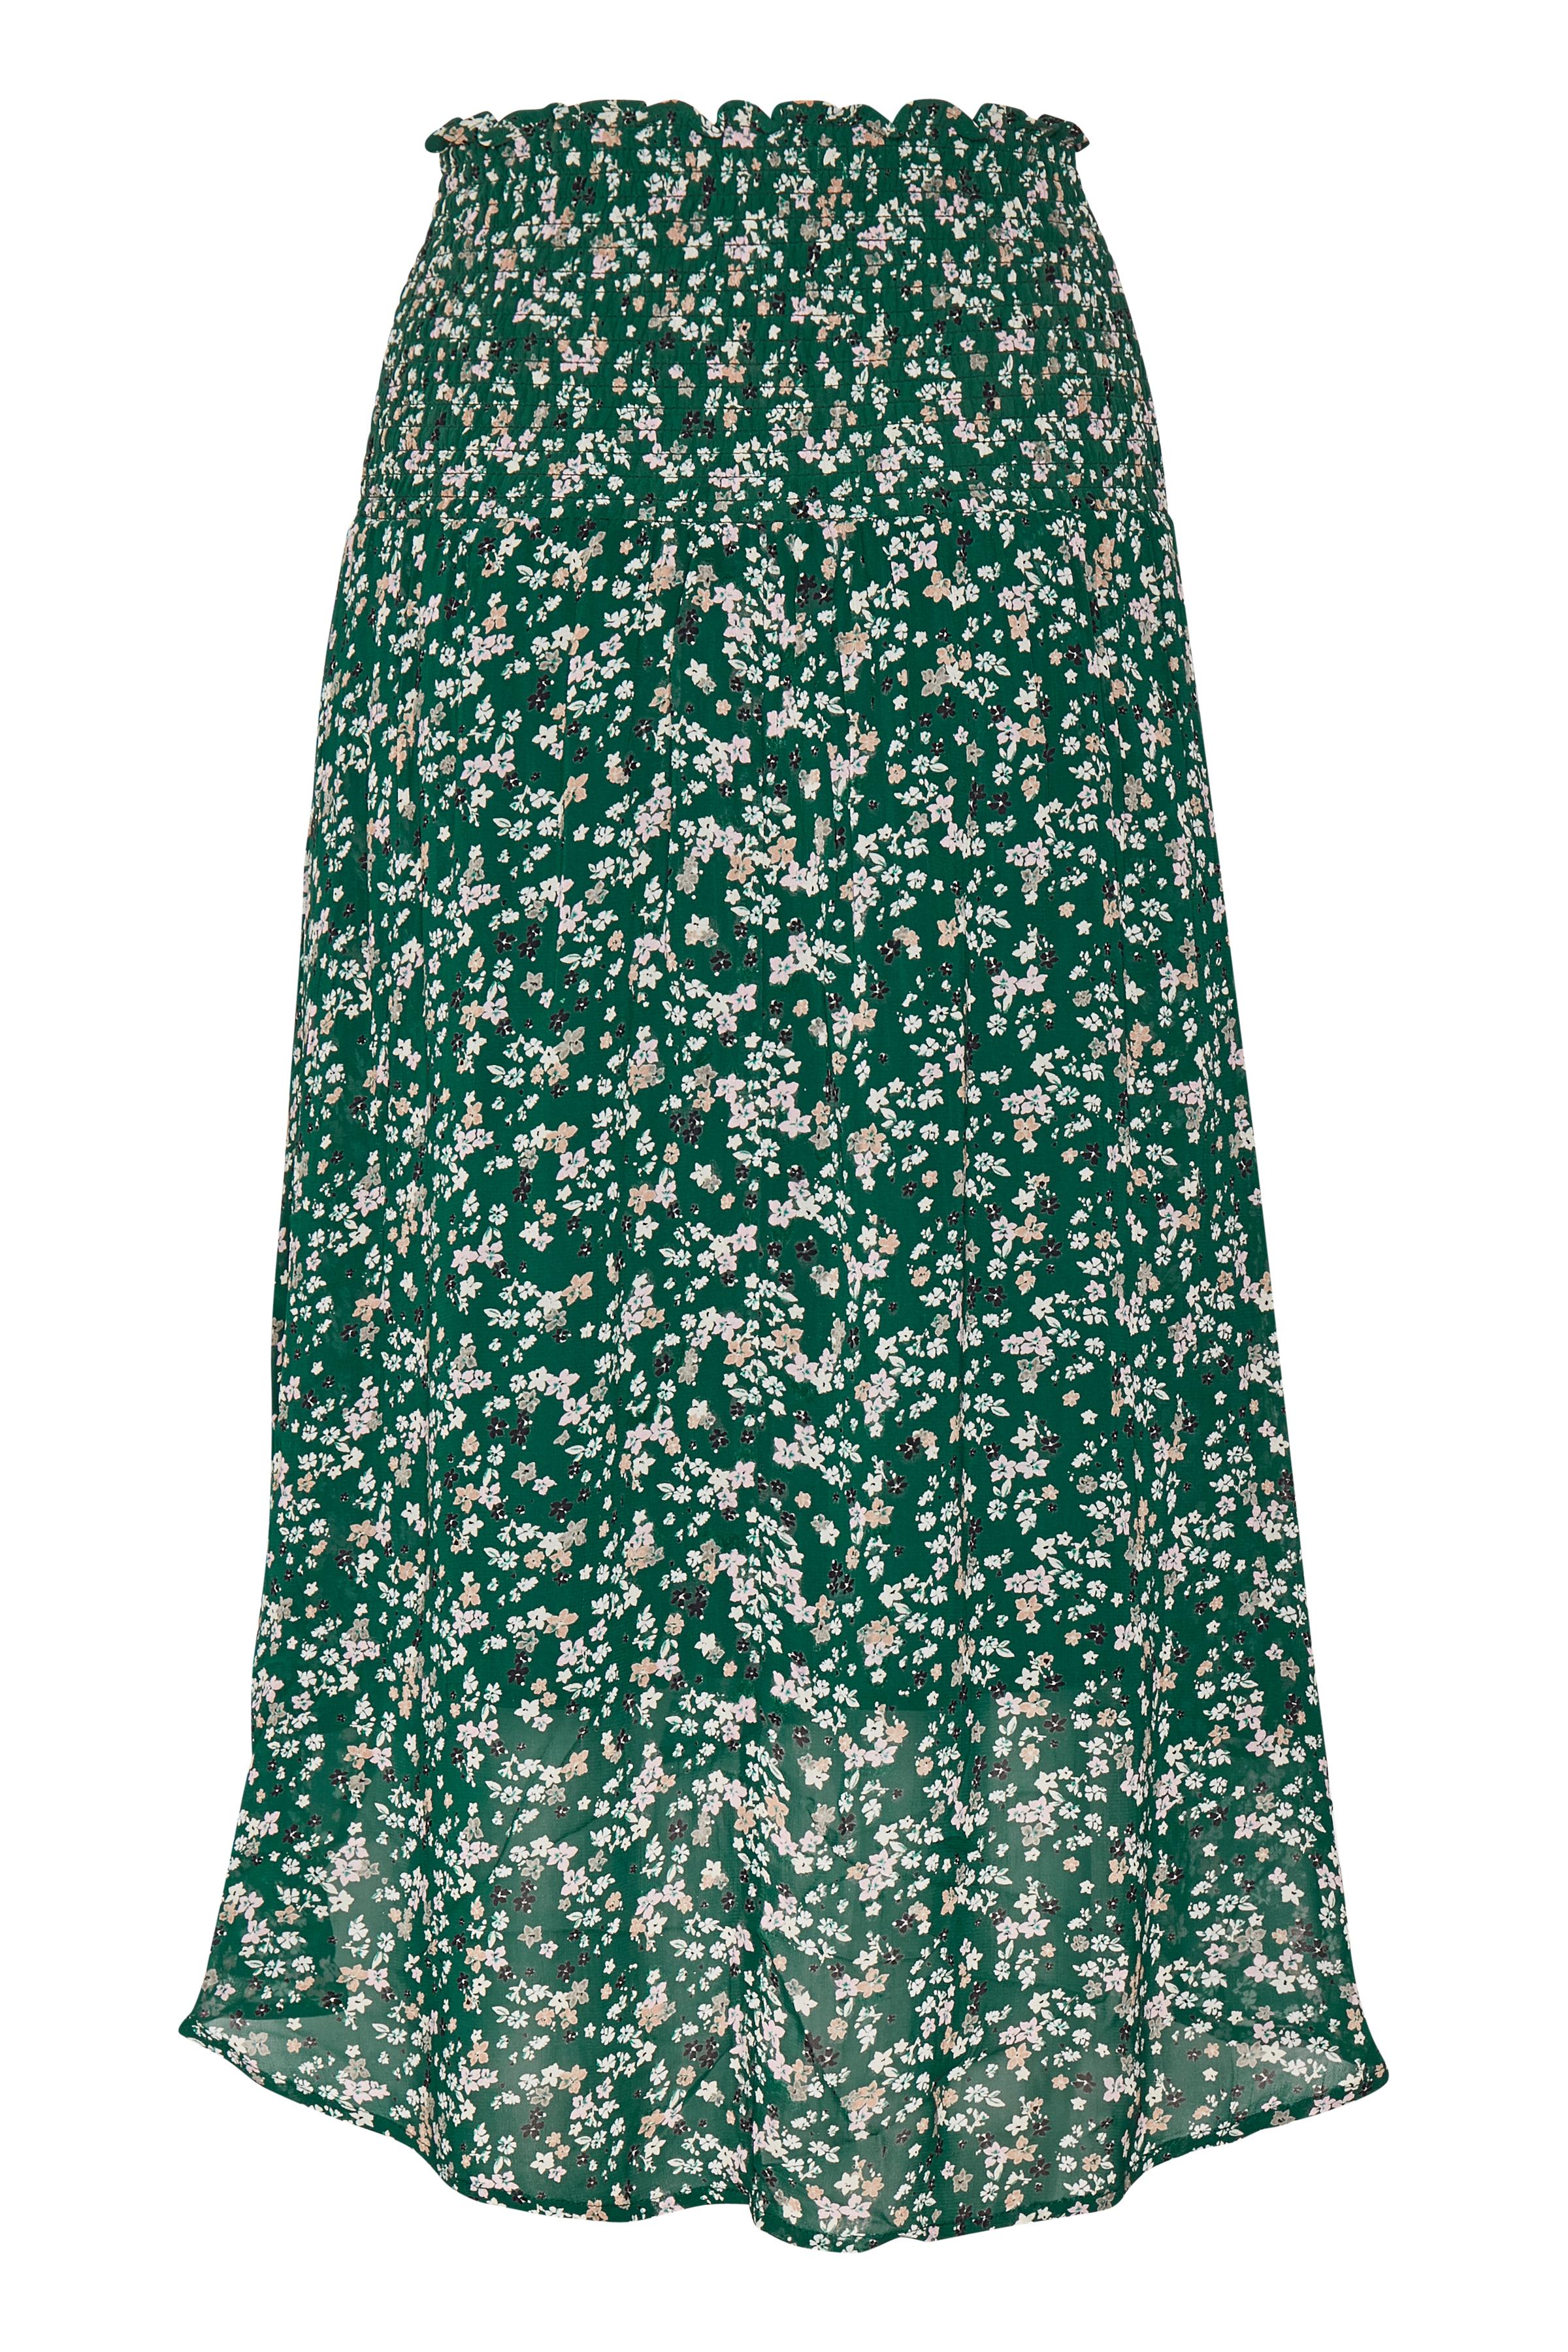 Warm Green Ditsy Flowers Nederdel – Køb Warm Green Ditsy Flowers Nederdel fra str. 32-44 her